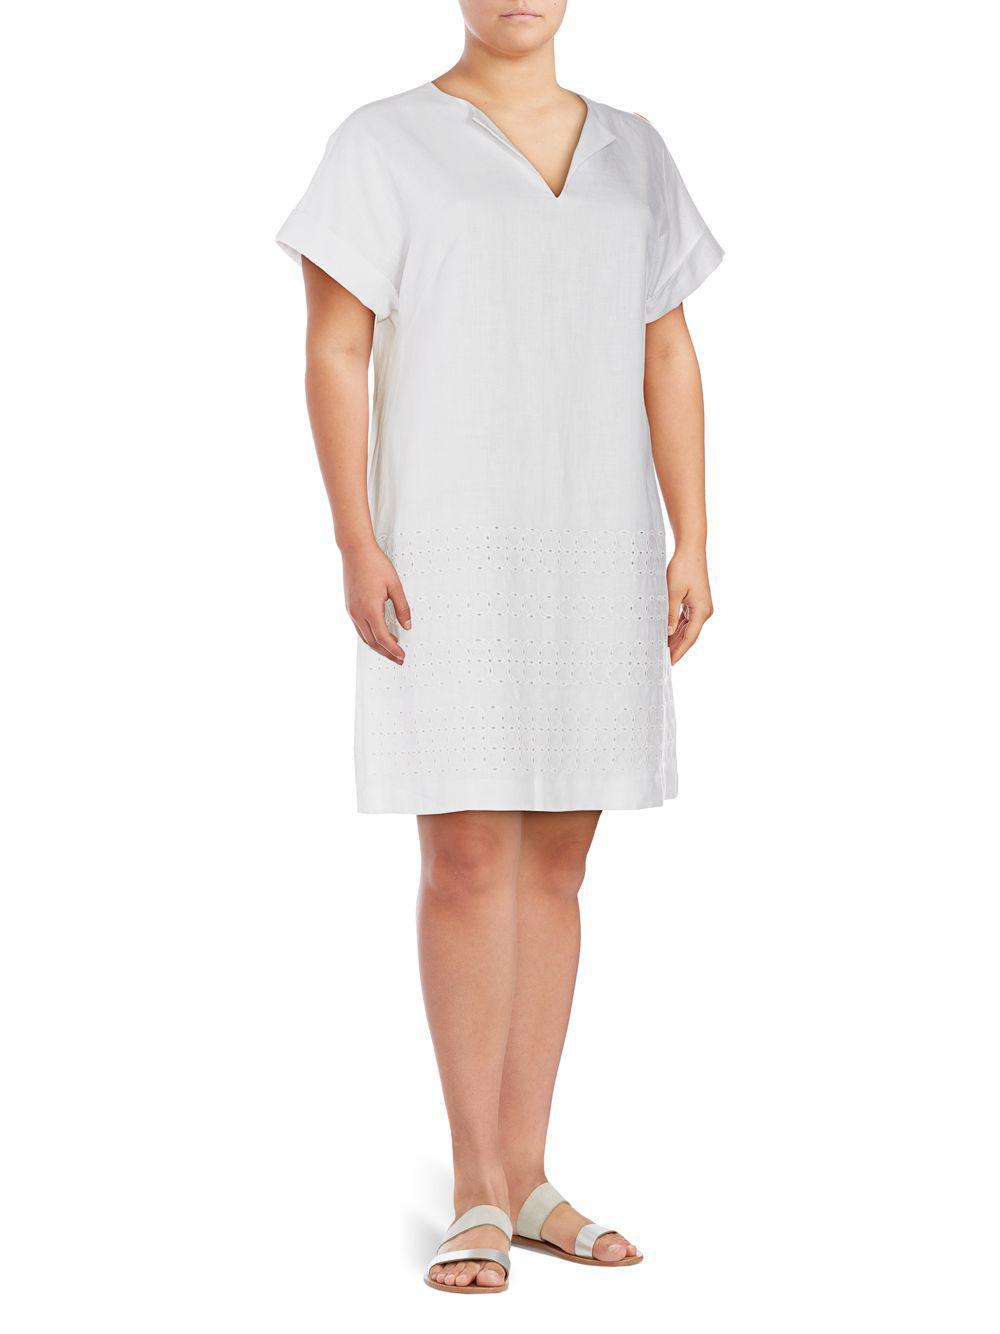 de35d0581c Lafayette 148 New York. Women s White Plus Fabian Embroidered Linen Dress